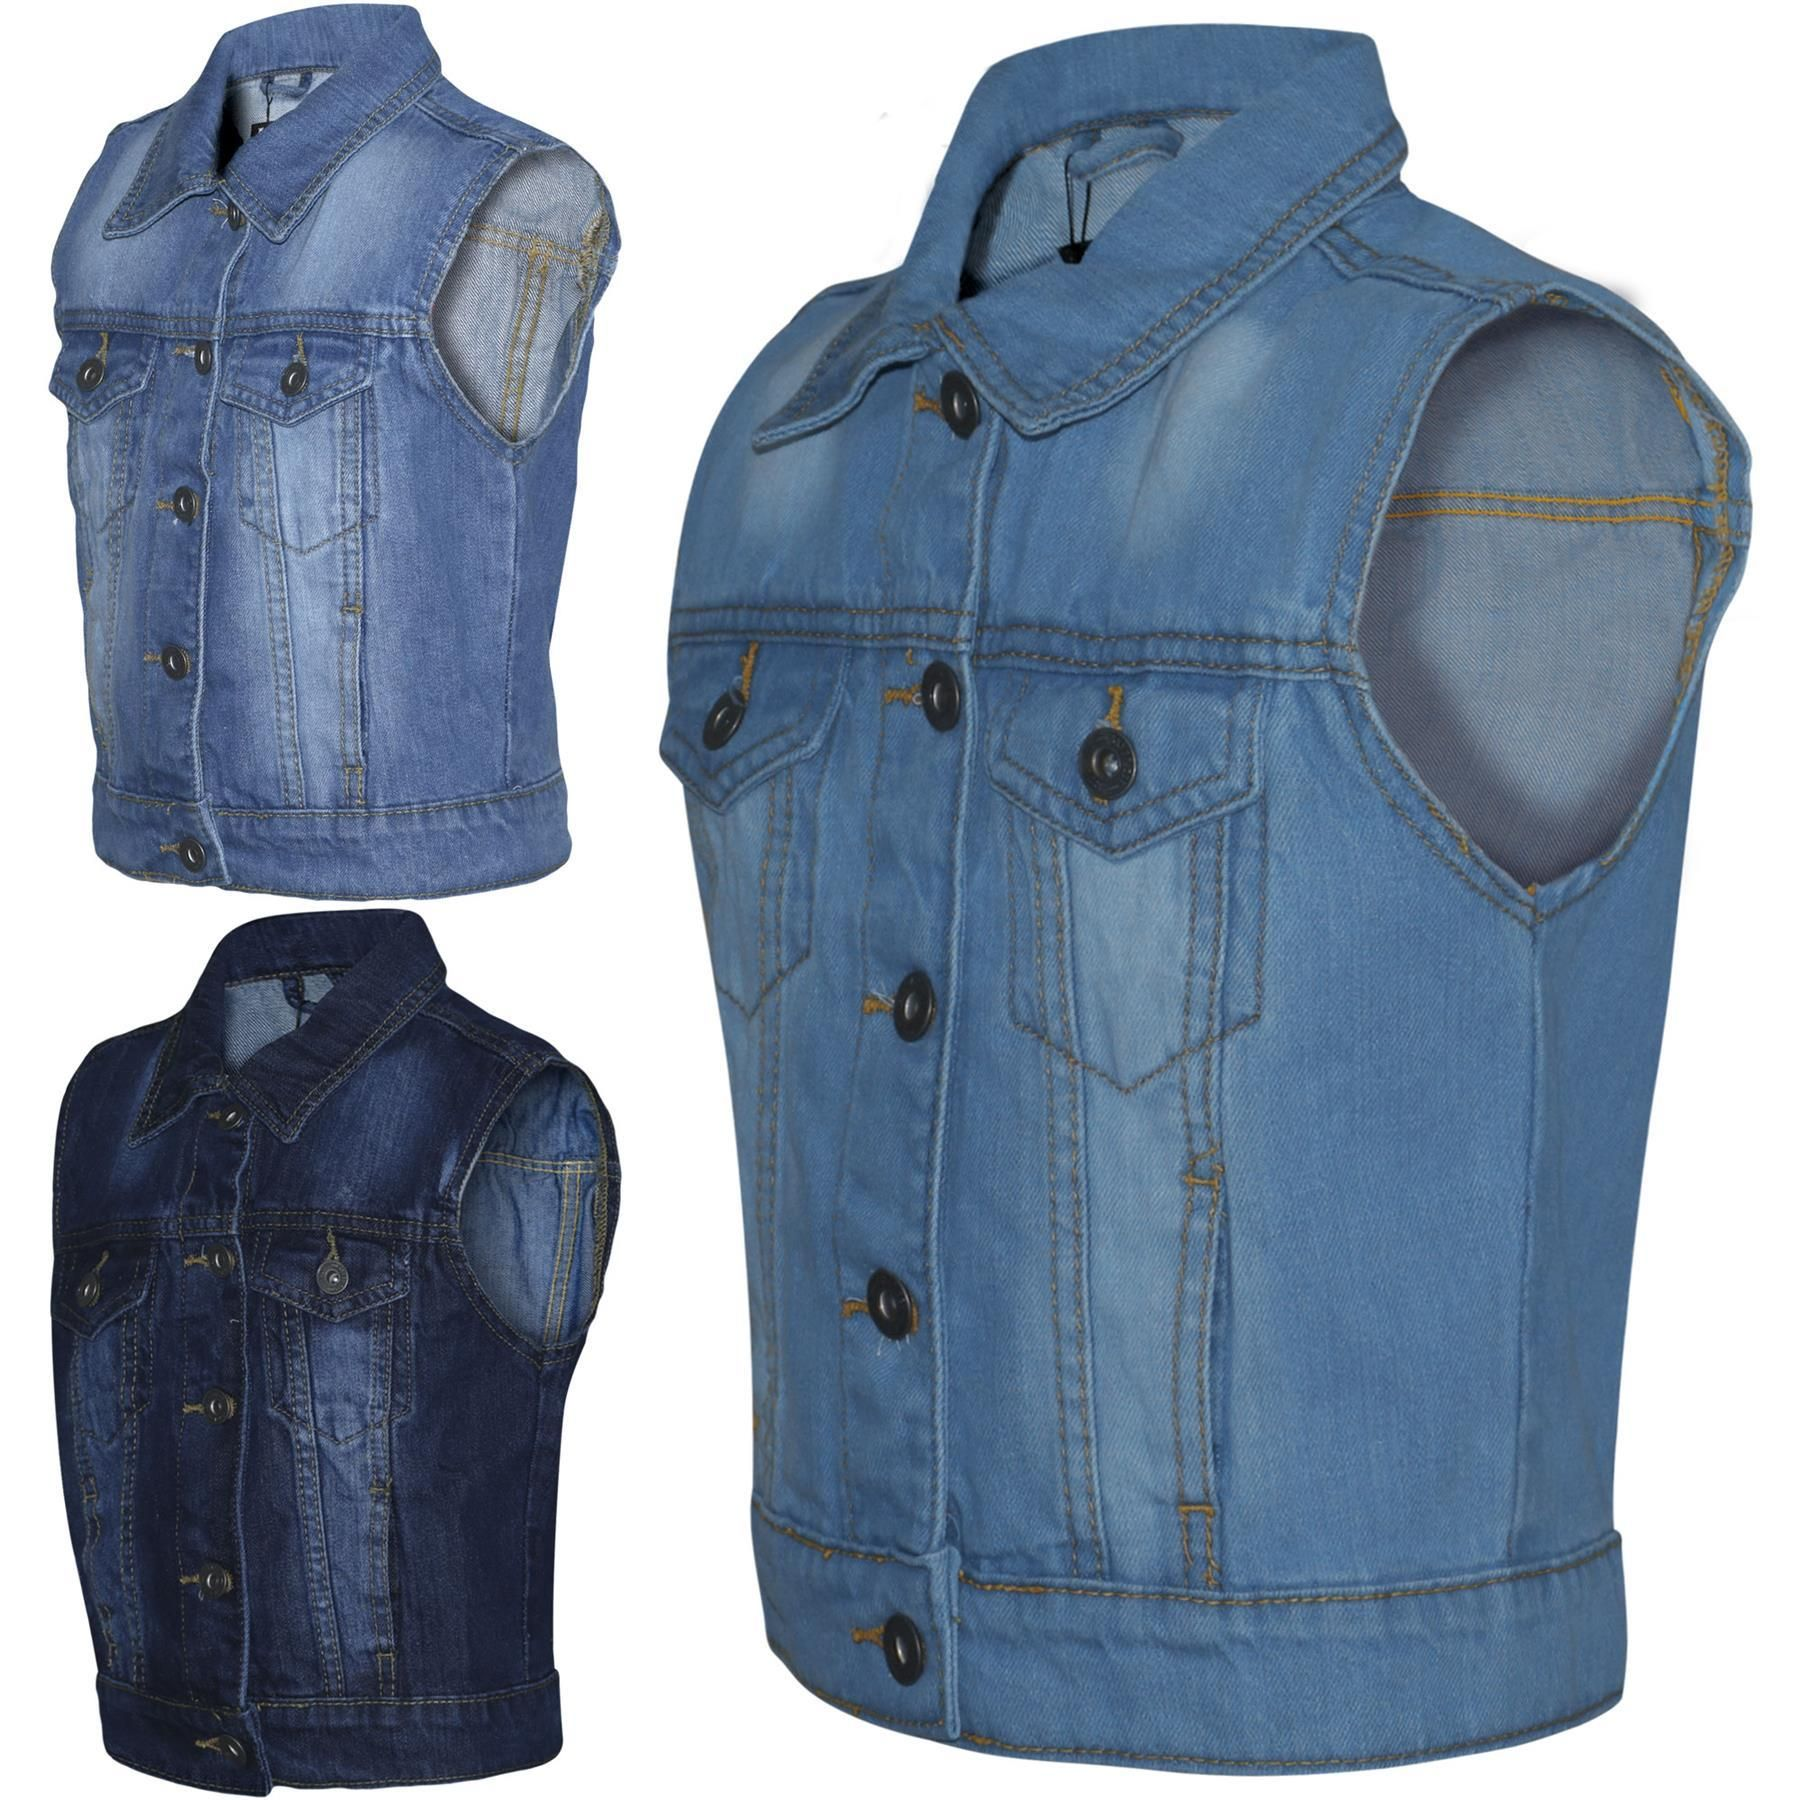 A2Z 4 Kids/® Kids Boys Denim Jackets Designers Light Blue Ripped Fashion Faded Jeans Jacket Stylish Coats New Age 3 4 5 6 7 8 9 10 11 12 13 Years